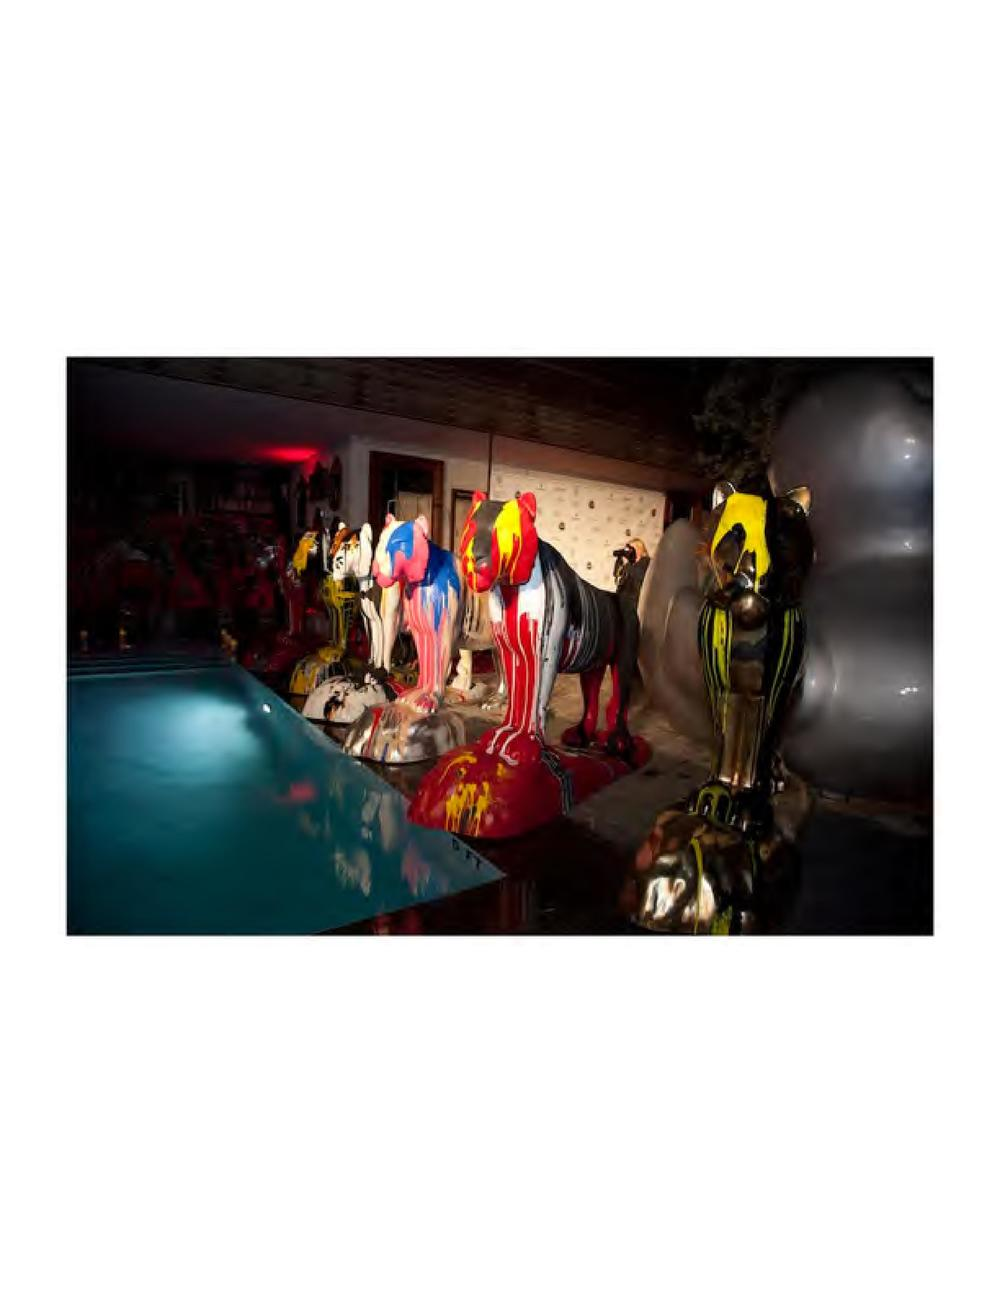 Miami_Art_Basel_Photographs-web-page-110.jpg